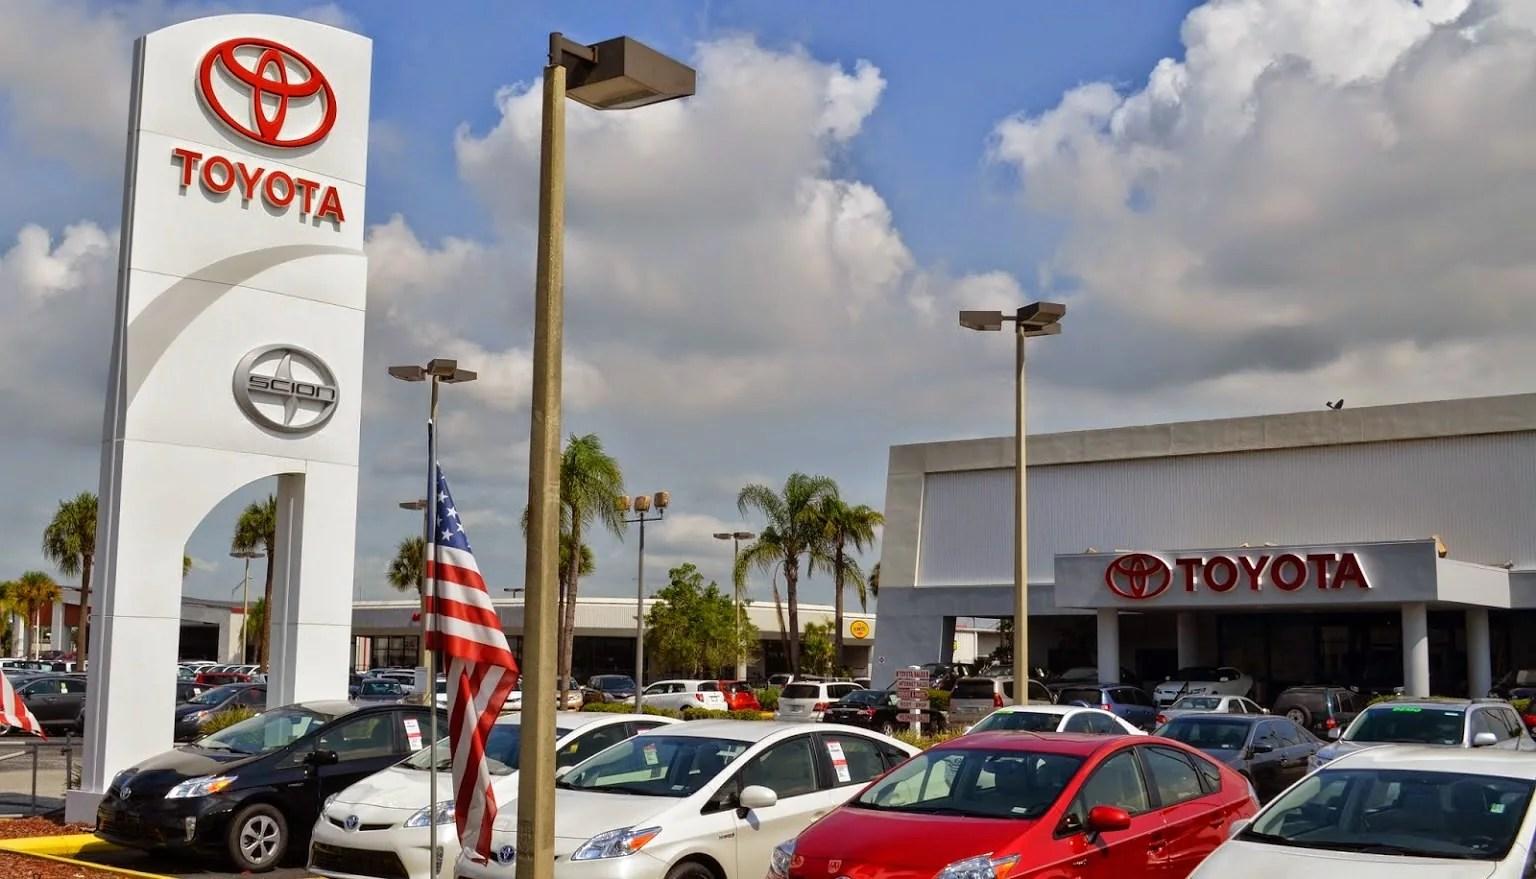 Toyota Dealership Near Me >> Toyota Dealers Near Me Top New Car Release Date